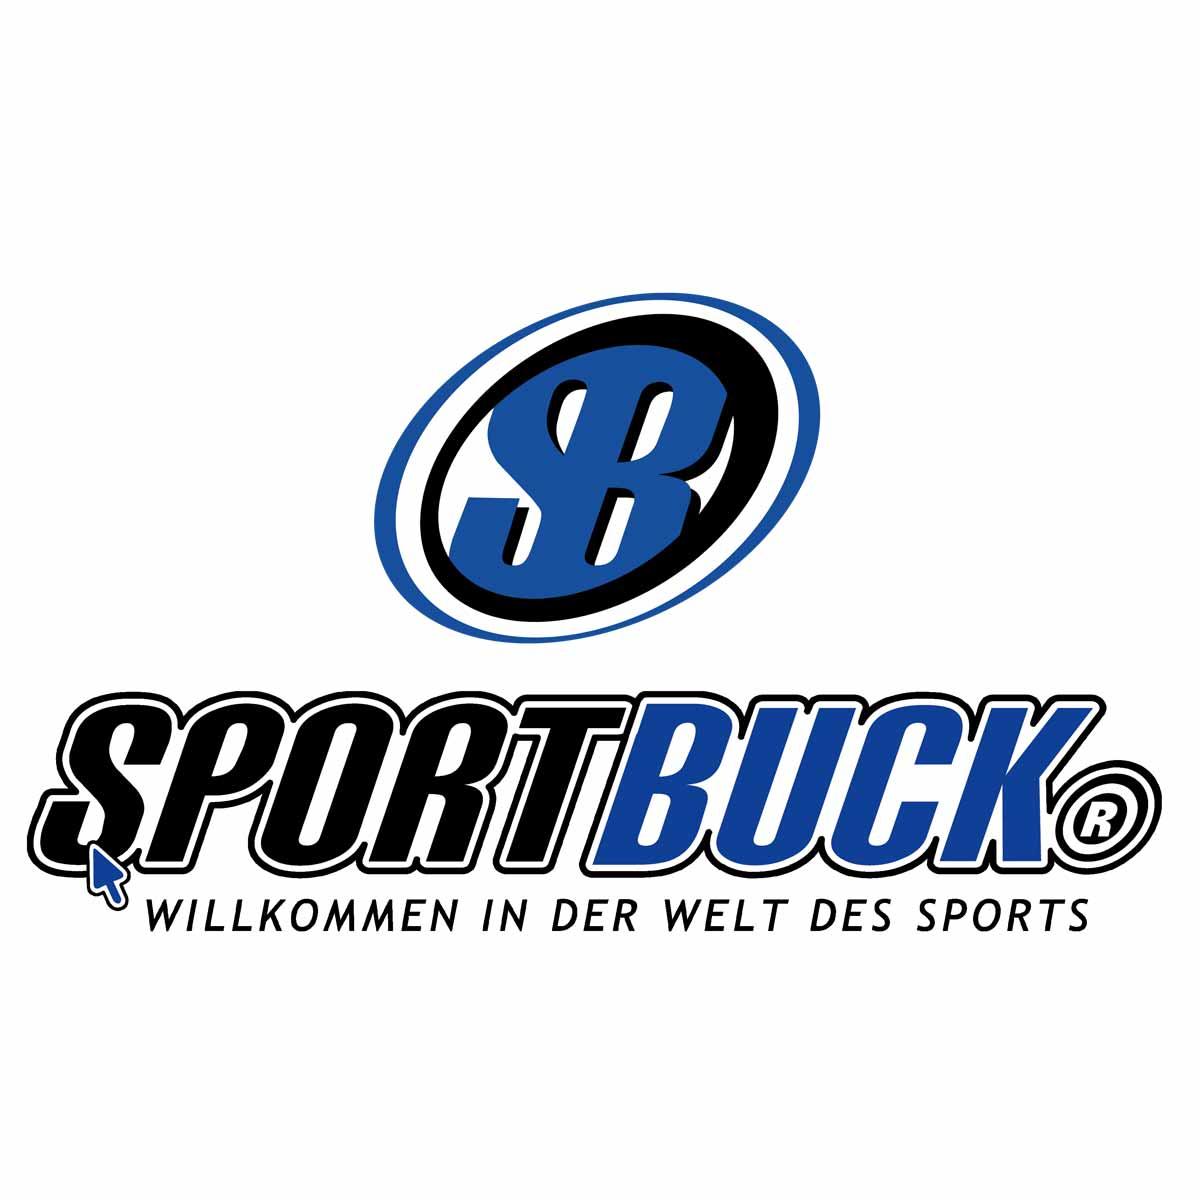 Tanita Ersatz-Papierrolle (BC-420, BC-418, SC-330, DC-430MA, DC-360)